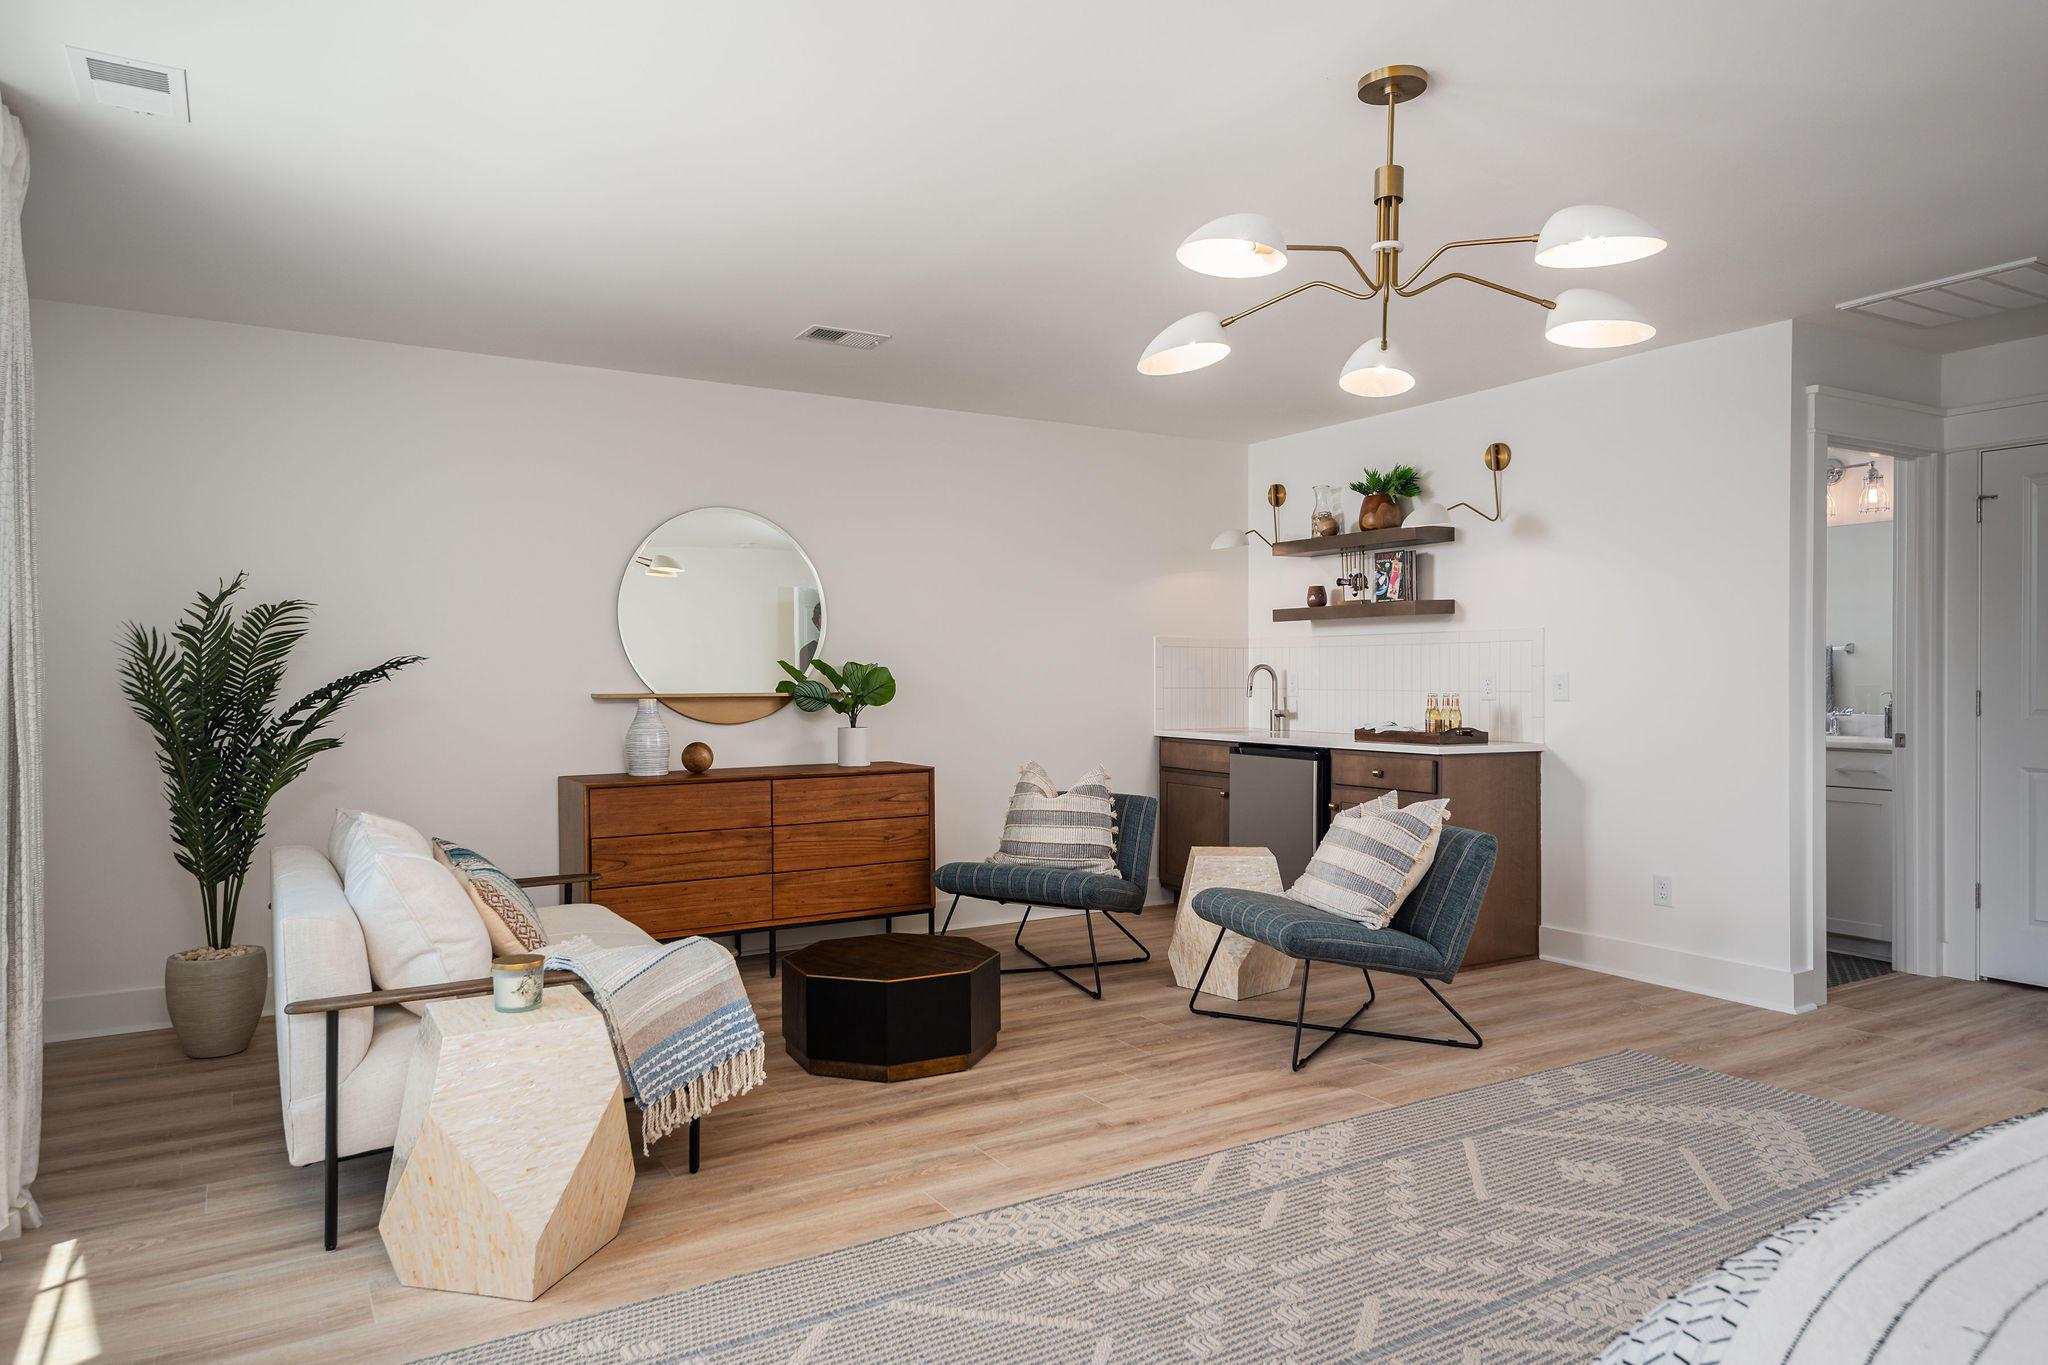 Midtown Homes For Sale - 1344 Upper Union, Mount Pleasant, SC - 29